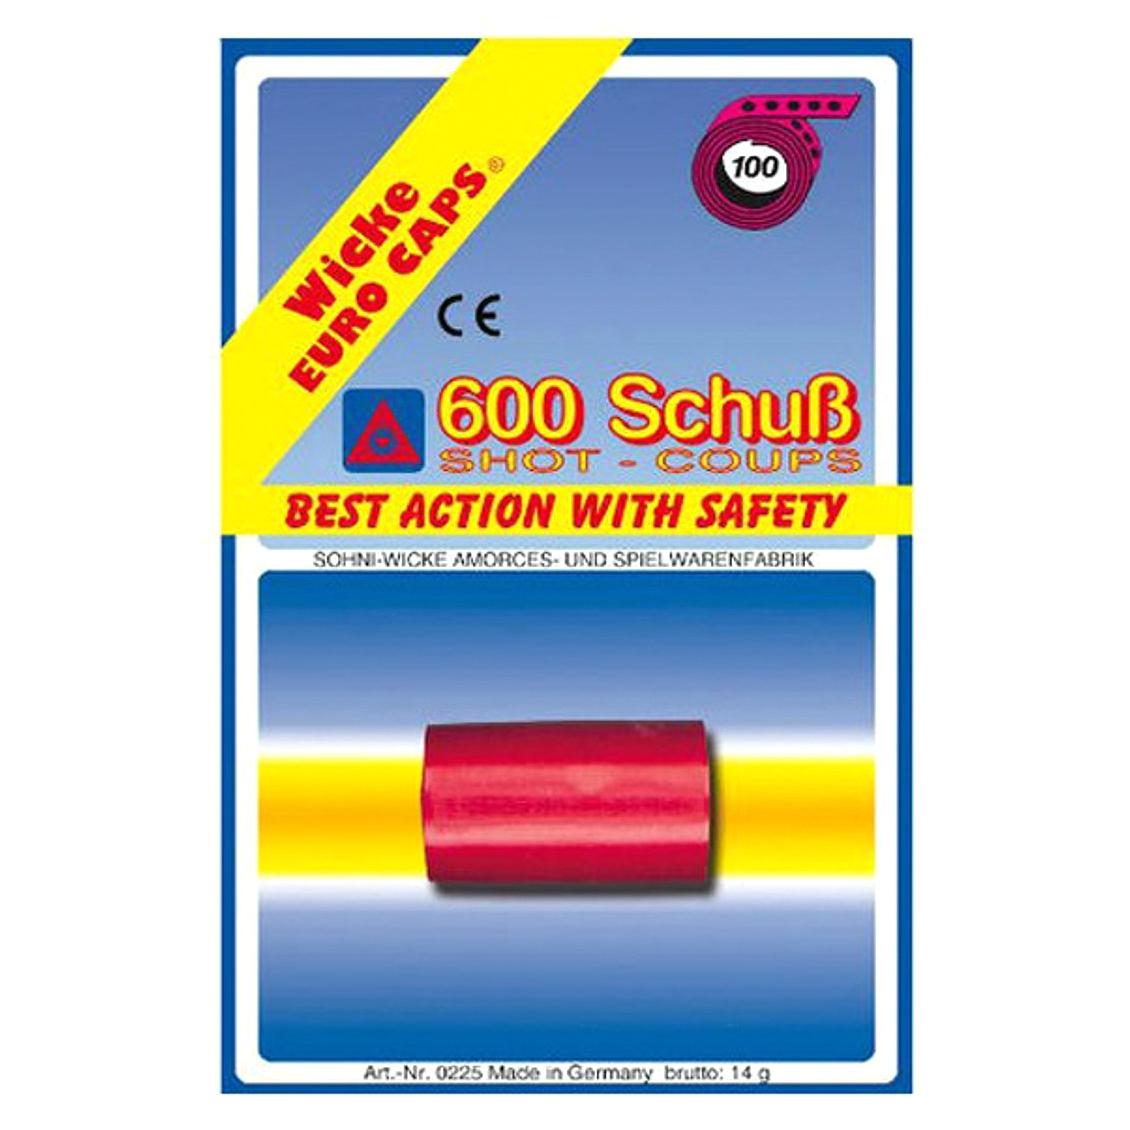 Пистоны Sohni-Wicke 100-зарядные 600 шт